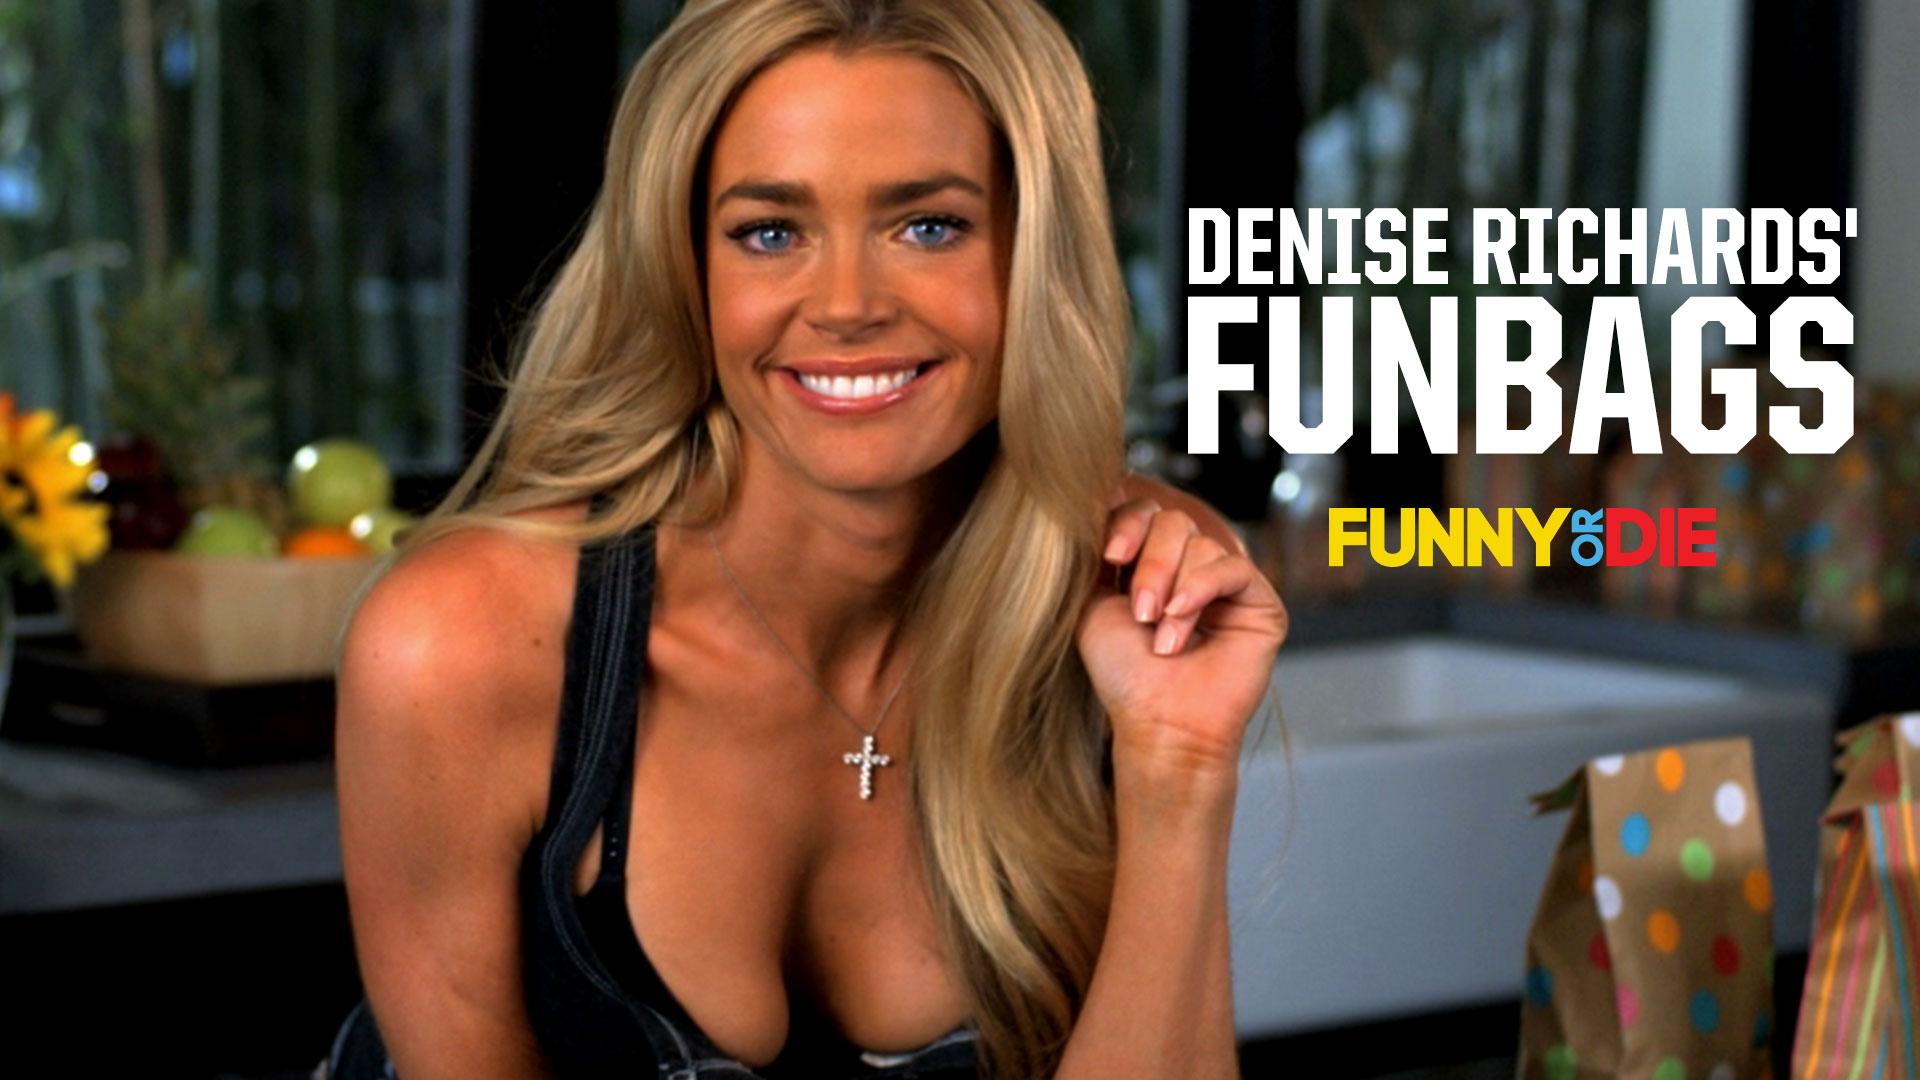 Denise Richards' Funbags